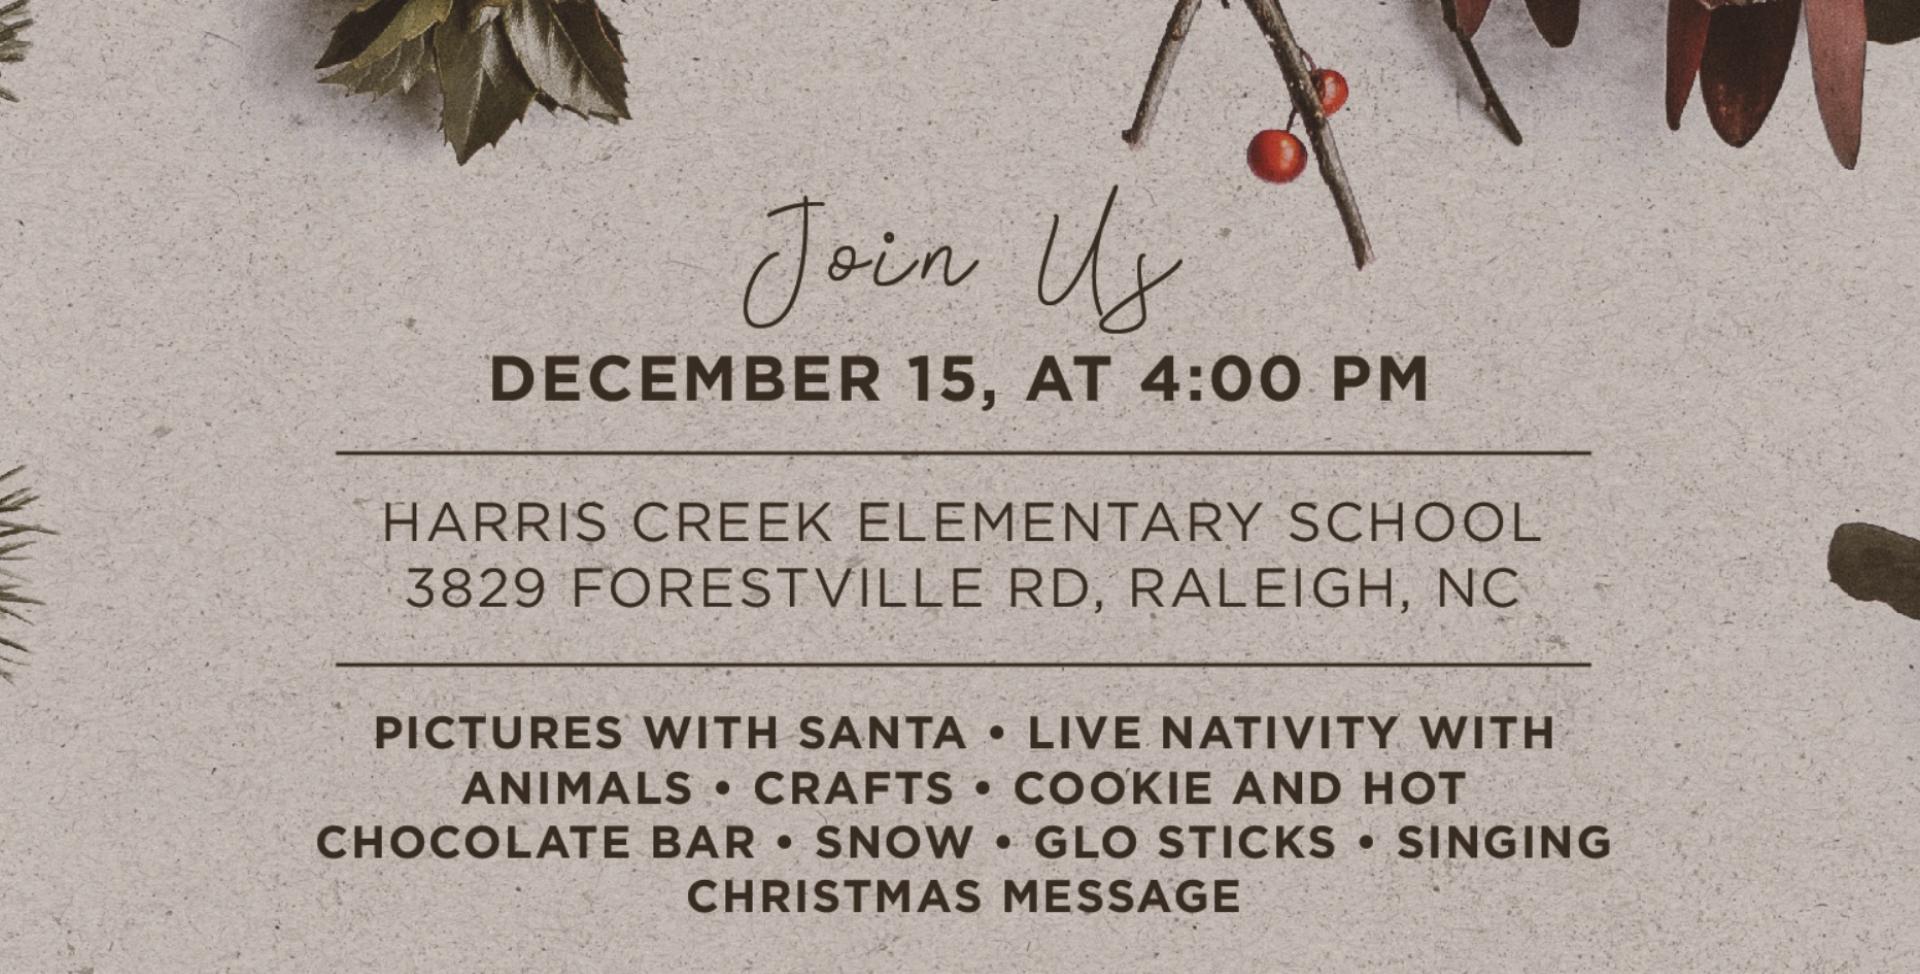 Christmas at Harris Creek